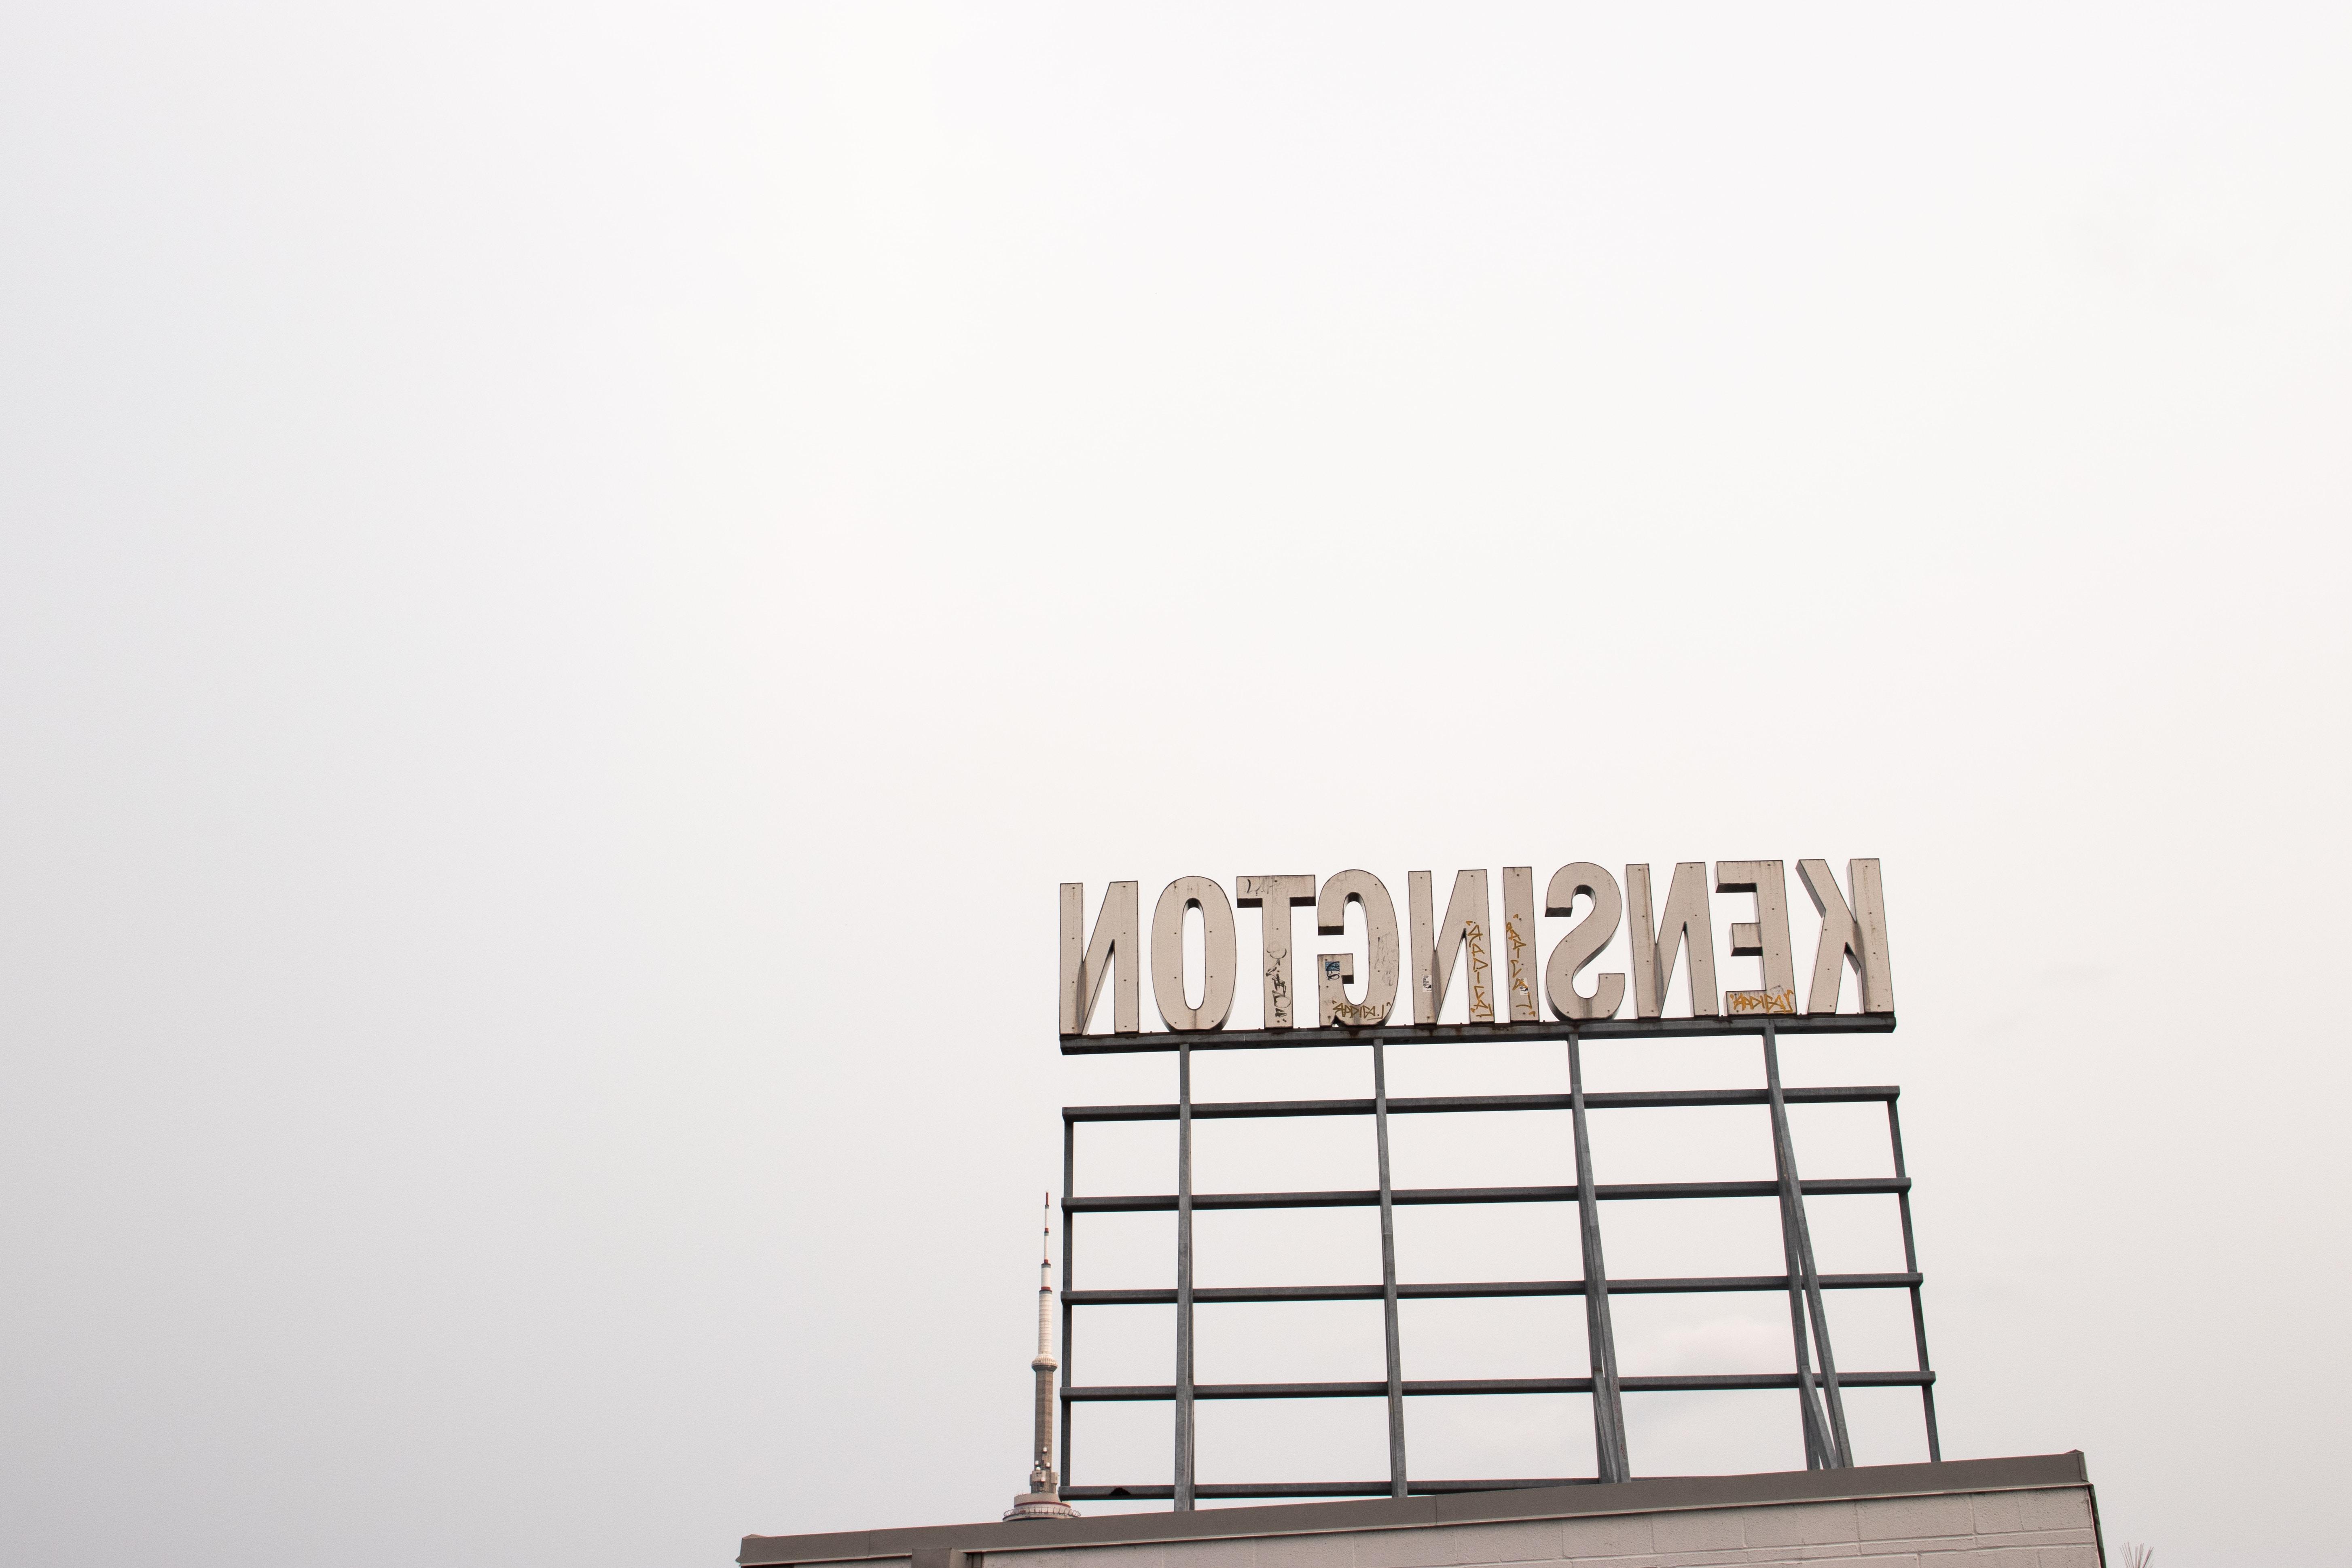 Kensington signage